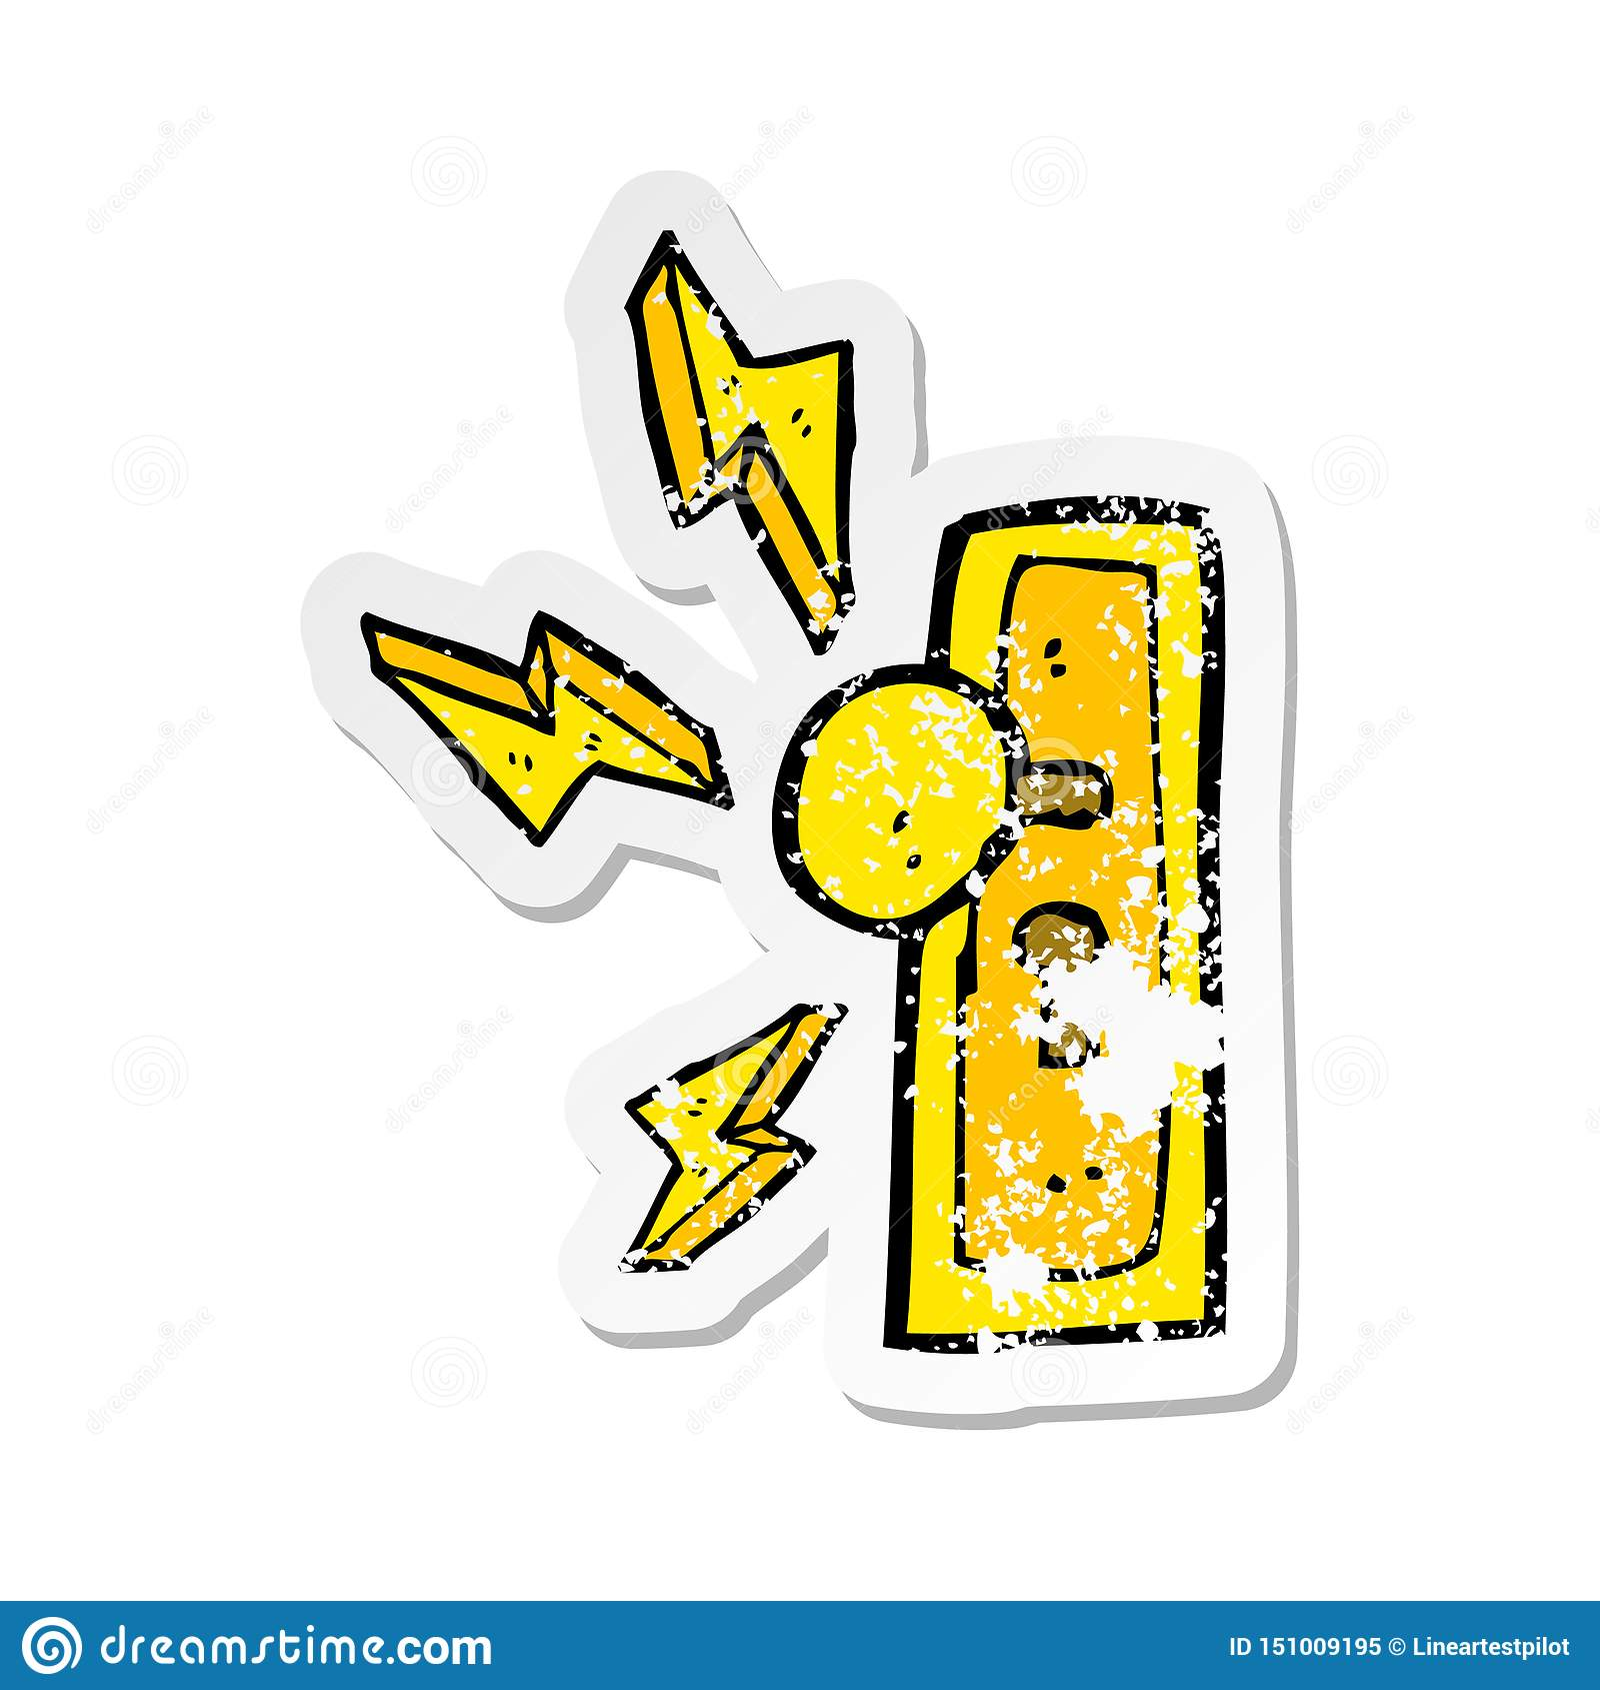 A creative retro distressed sticker of a cartoon door knob